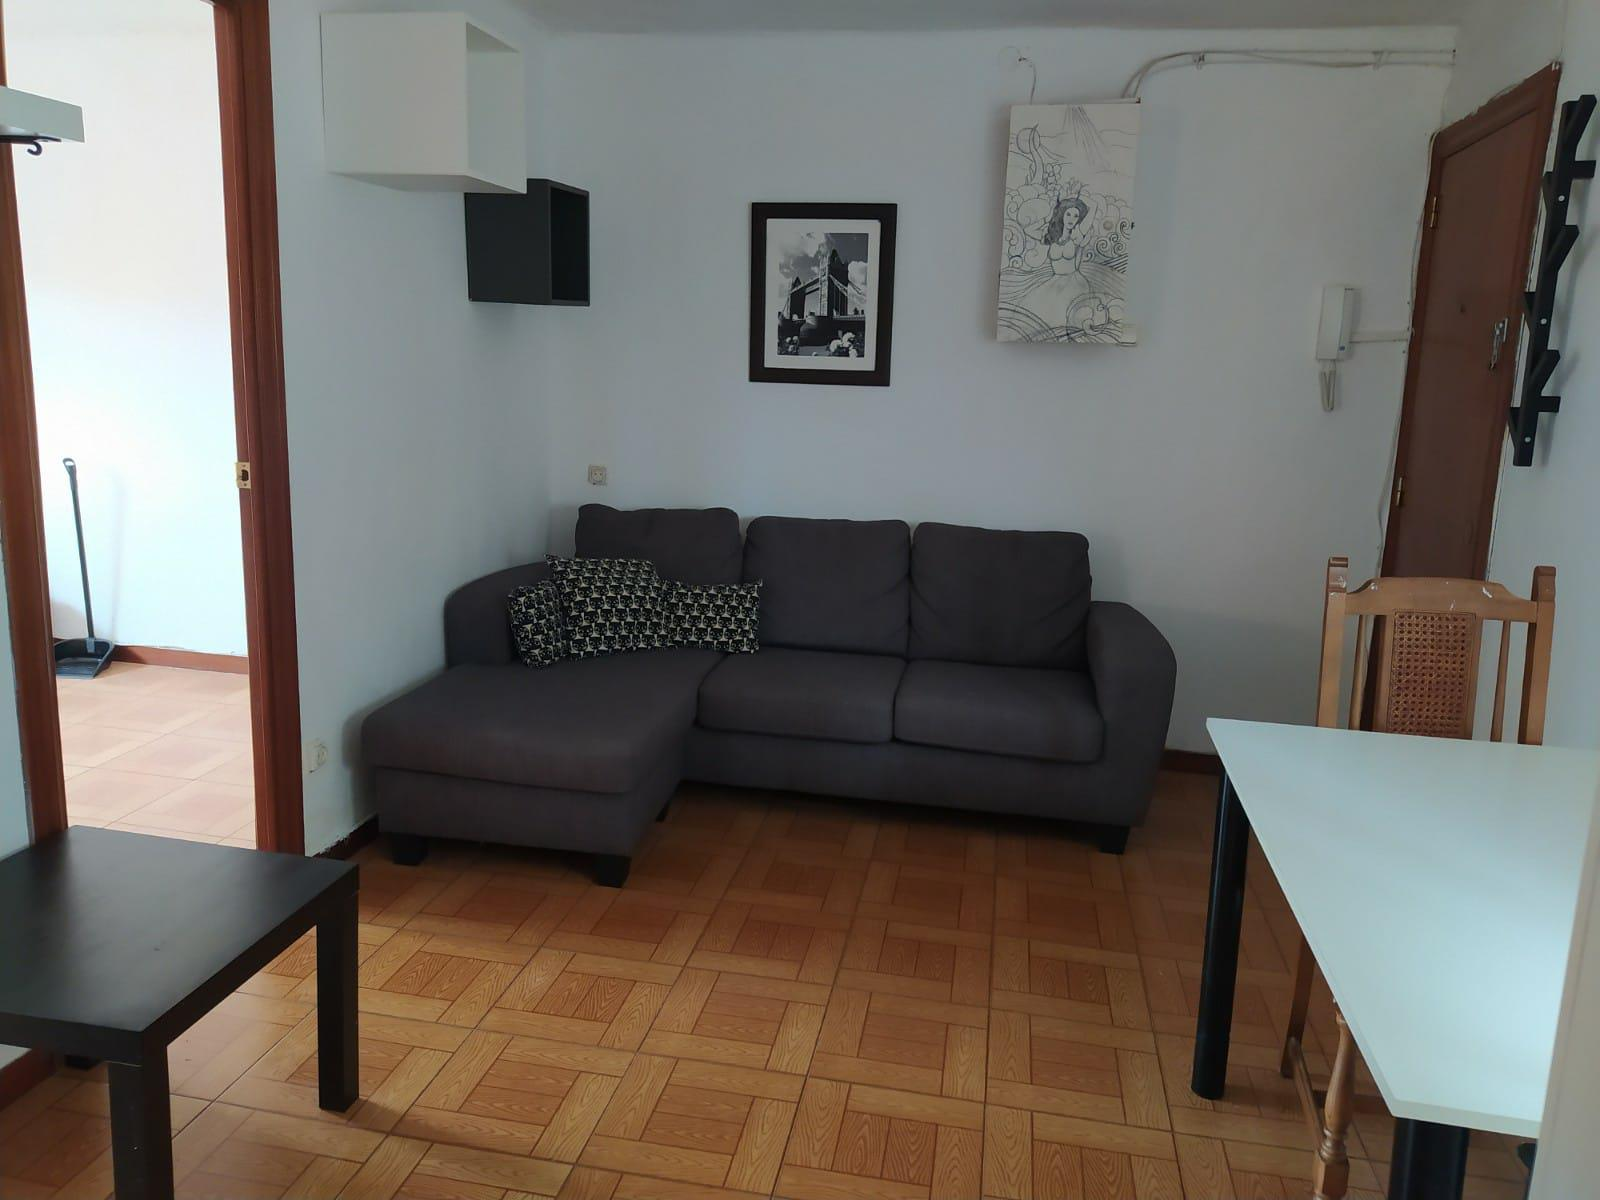 Imagen 2 Apartamento en alquiler en Hospitalet De Llobregat L´ / Junto a centro comercial finestr...